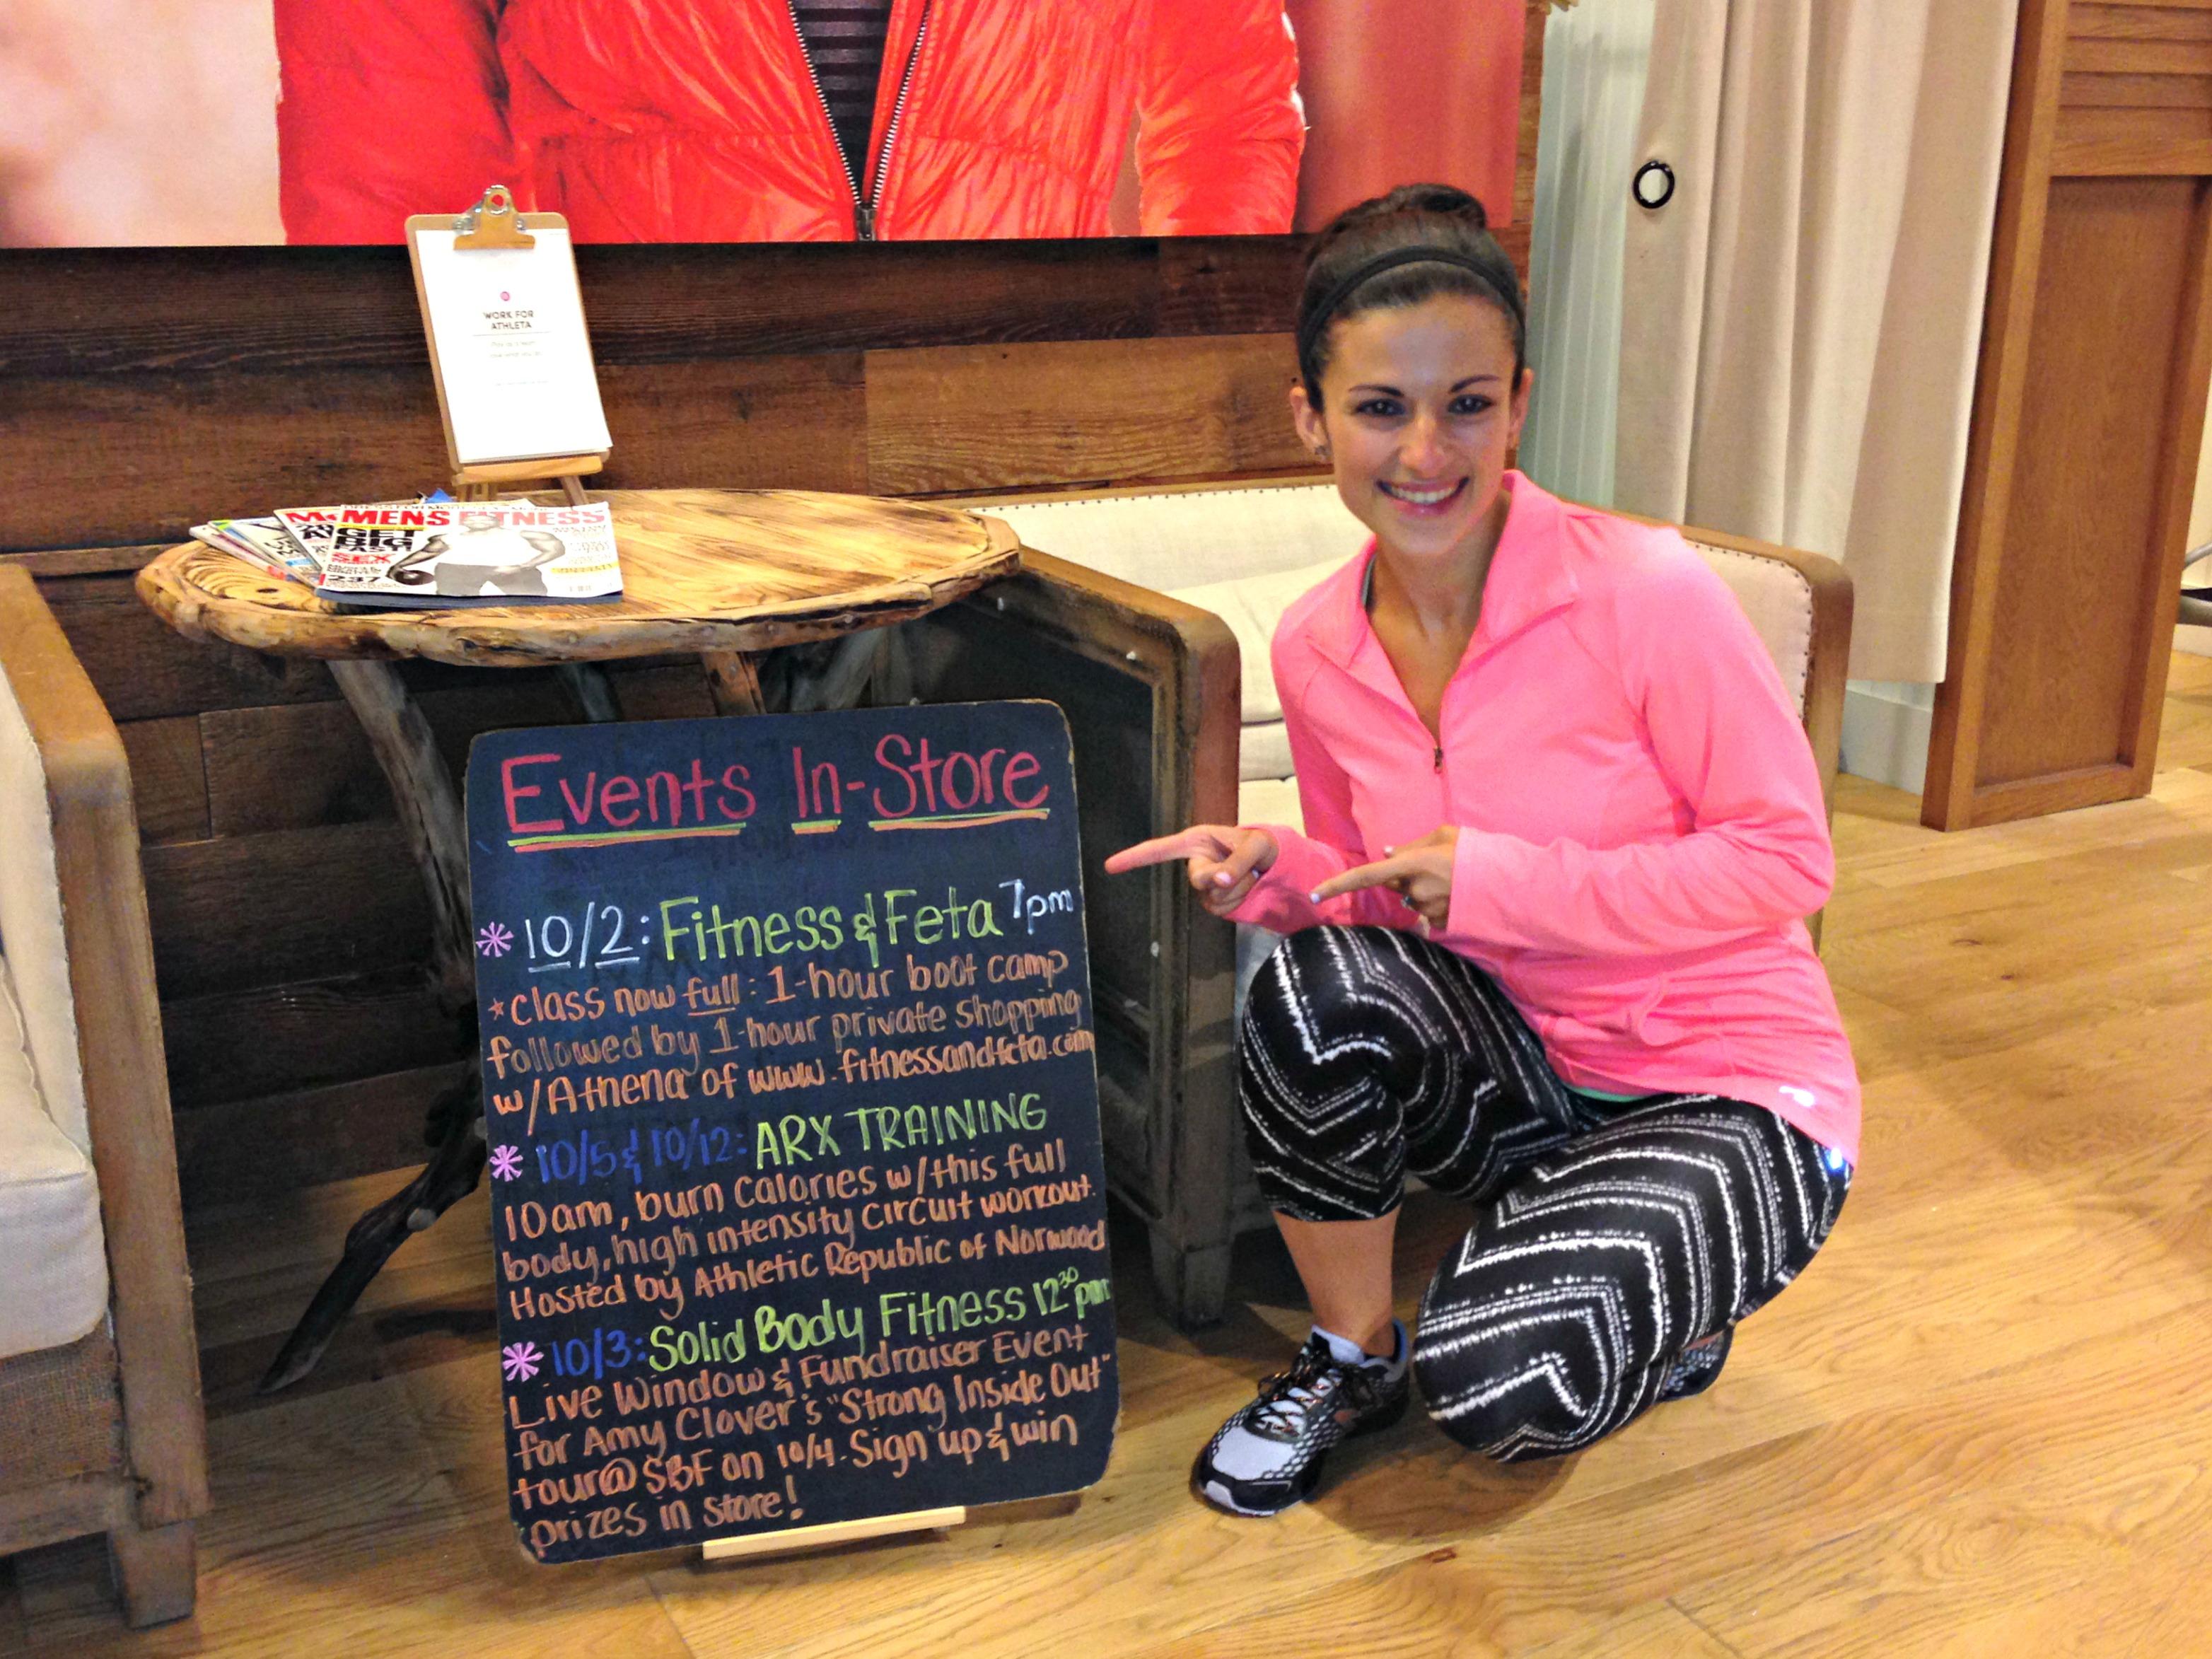 Bootcamp Fitness Feta Superset Style Circuit Workout Ideas Athleta Legacy Place Birthday